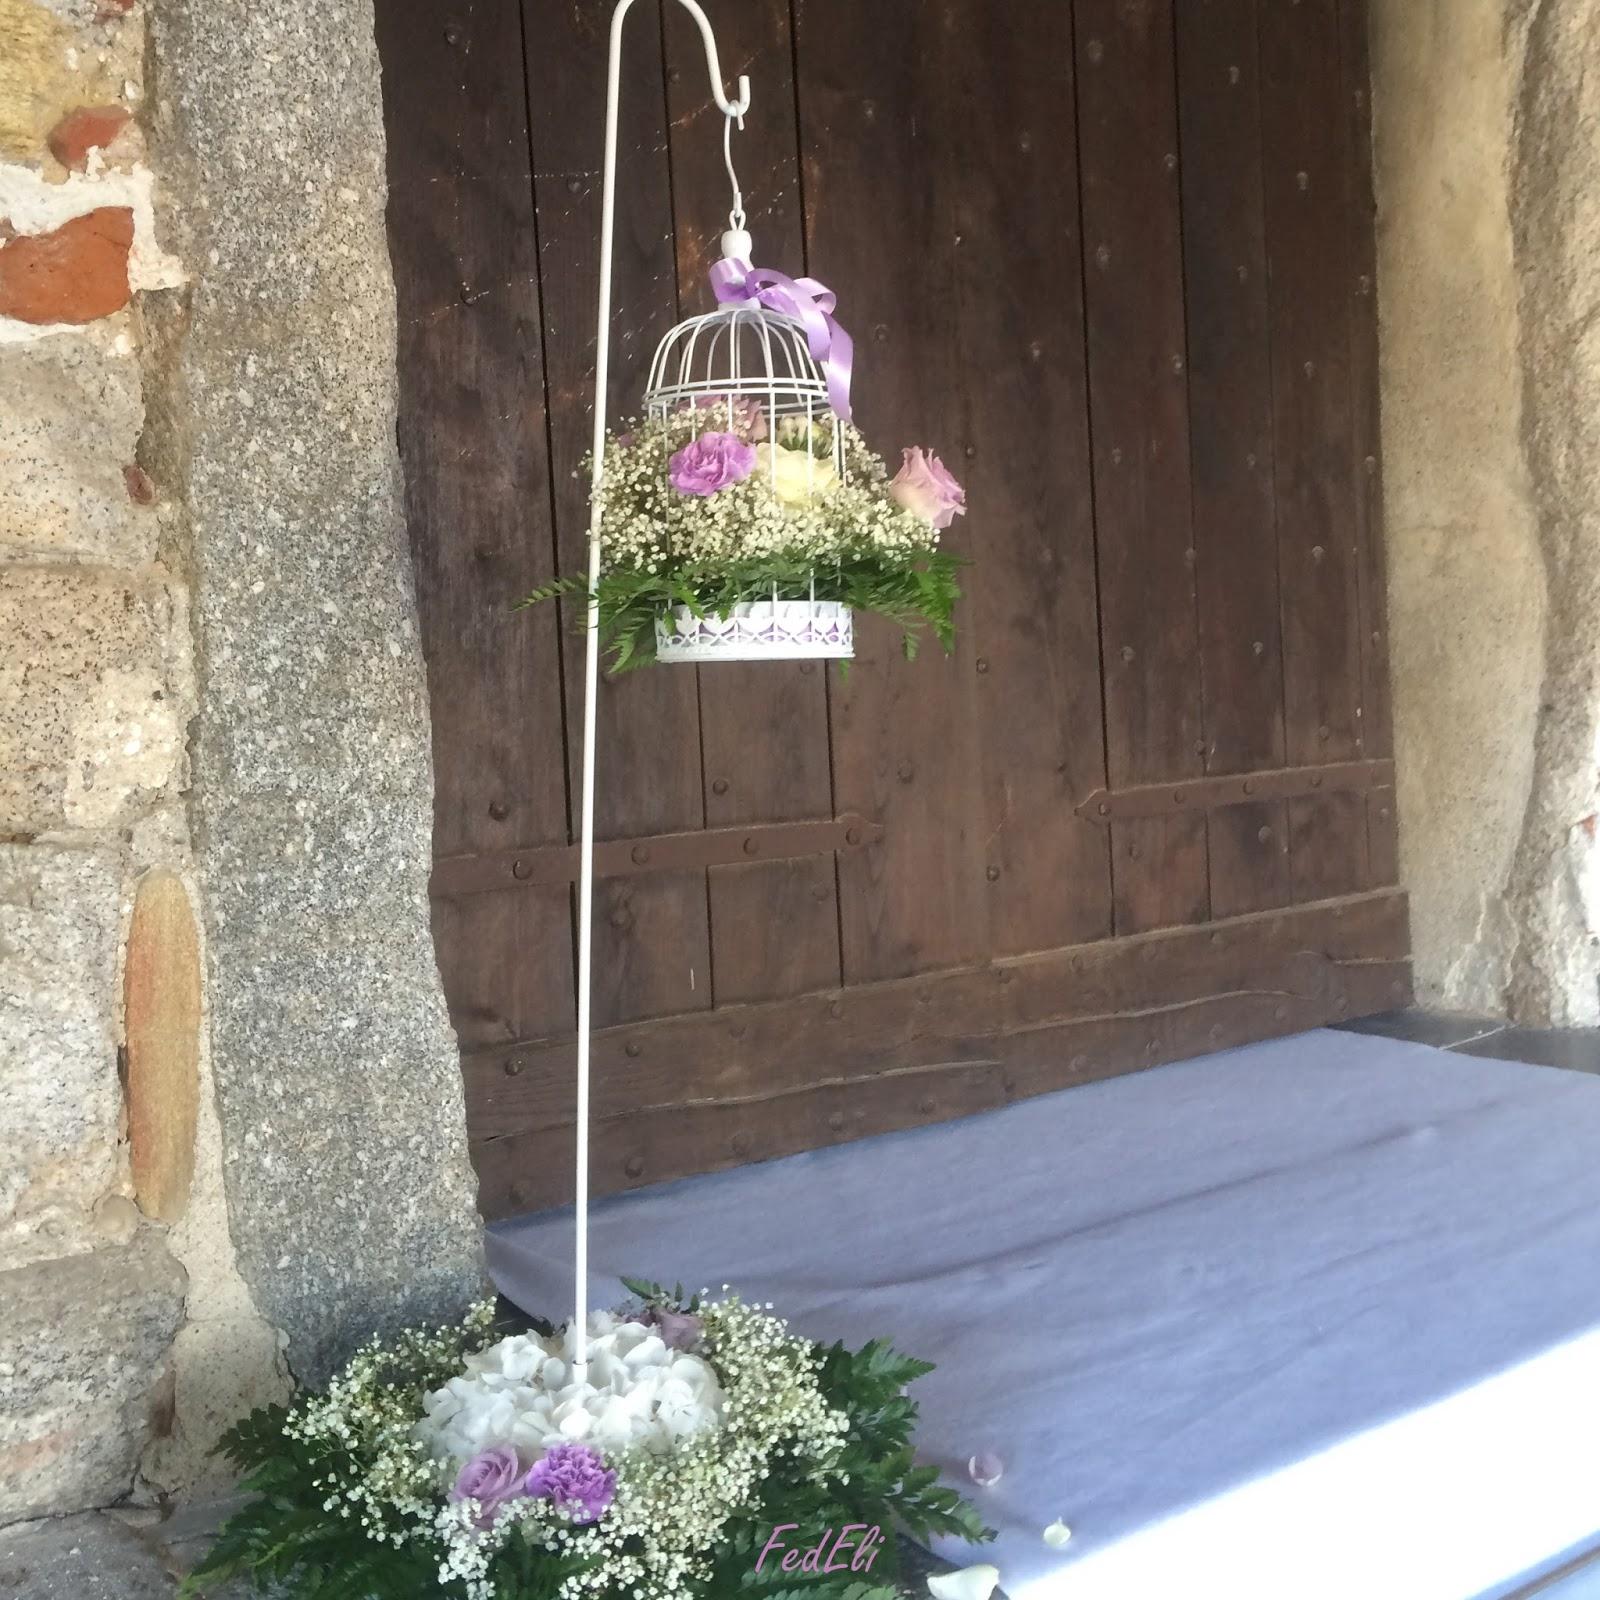 Shabby Chic Fiori Matrimonio.Fiori Fedeli Flower Design Lab Matrimonio Shabby Chic